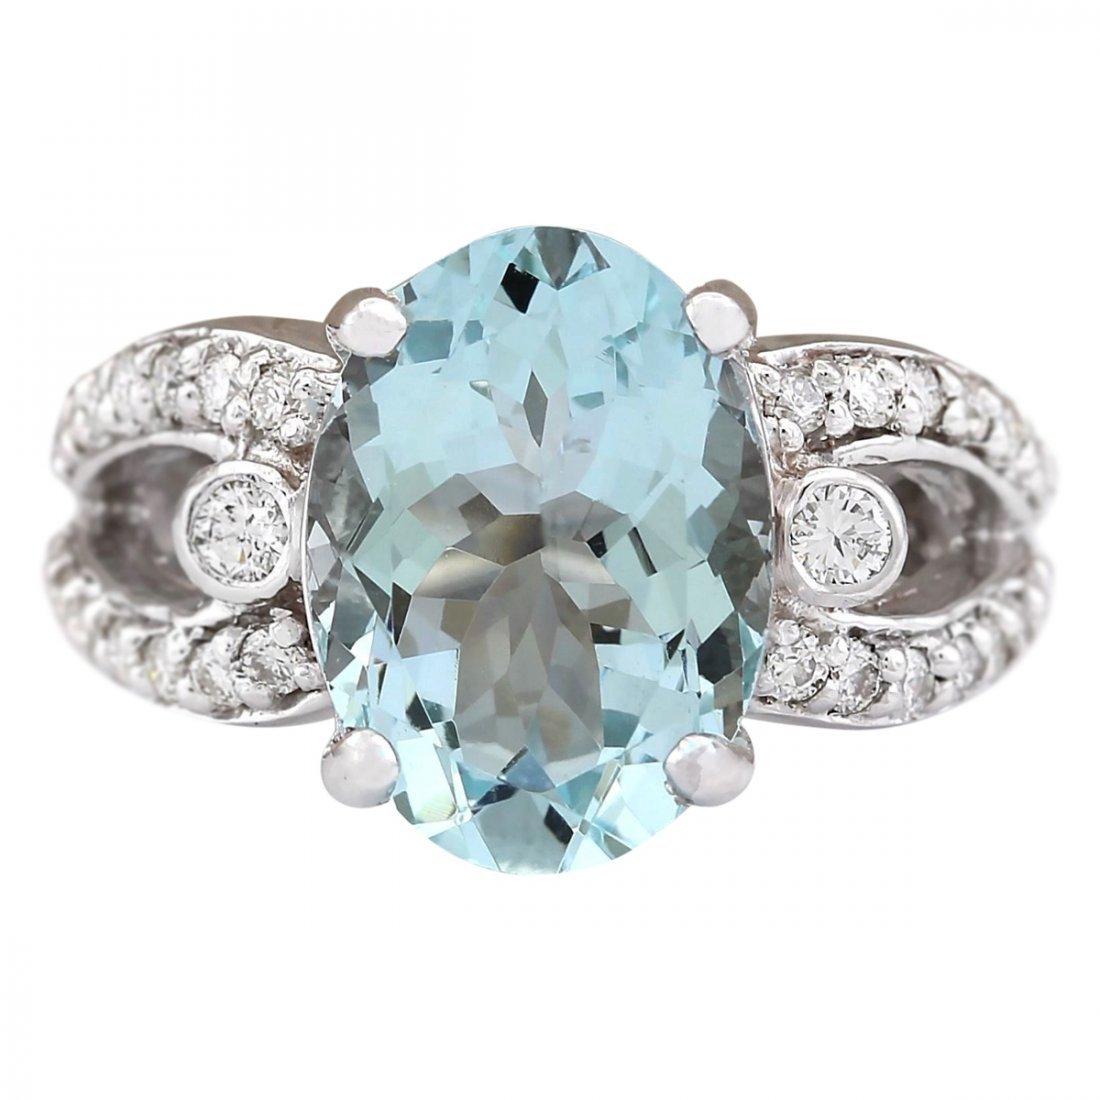 6.02 CTW Natural Aquamarine And Diamond Ring In 14k